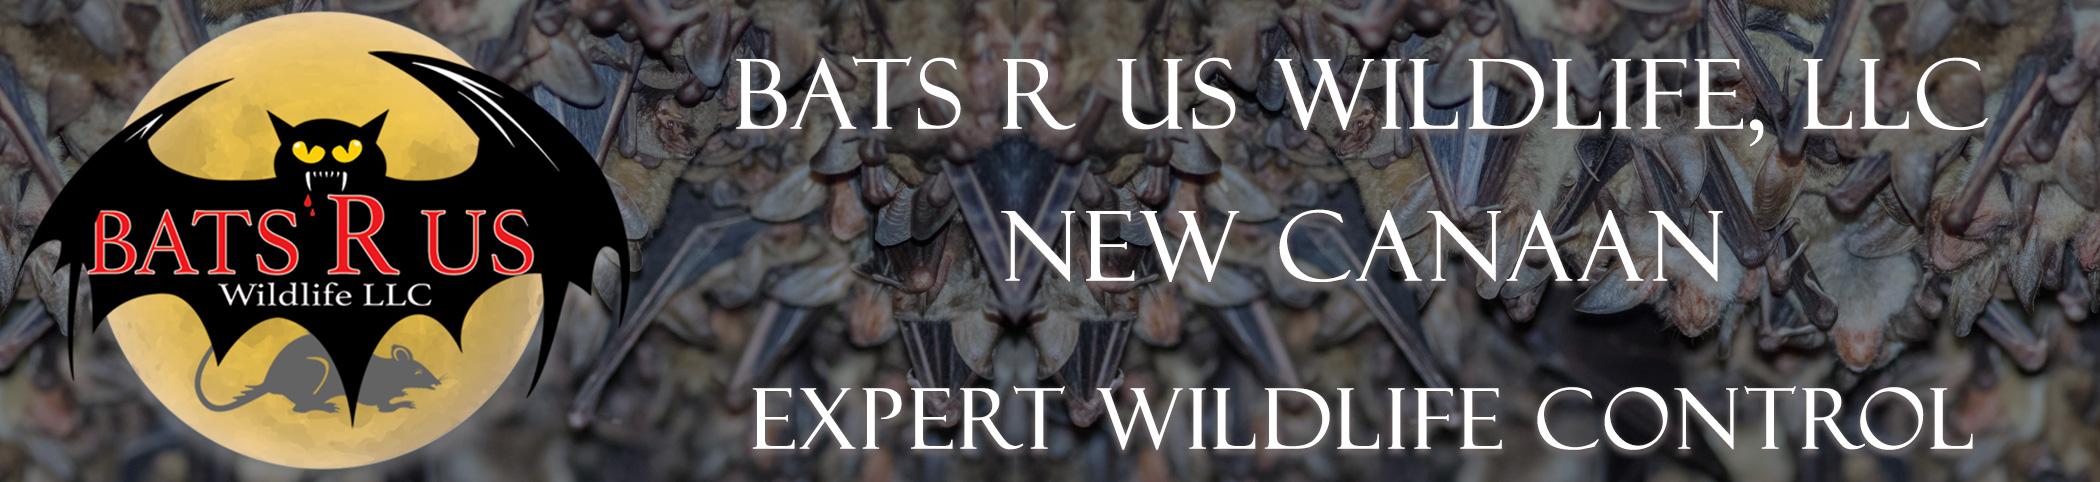 Bats R Us Wildlife LLC New Canaan Connecticut